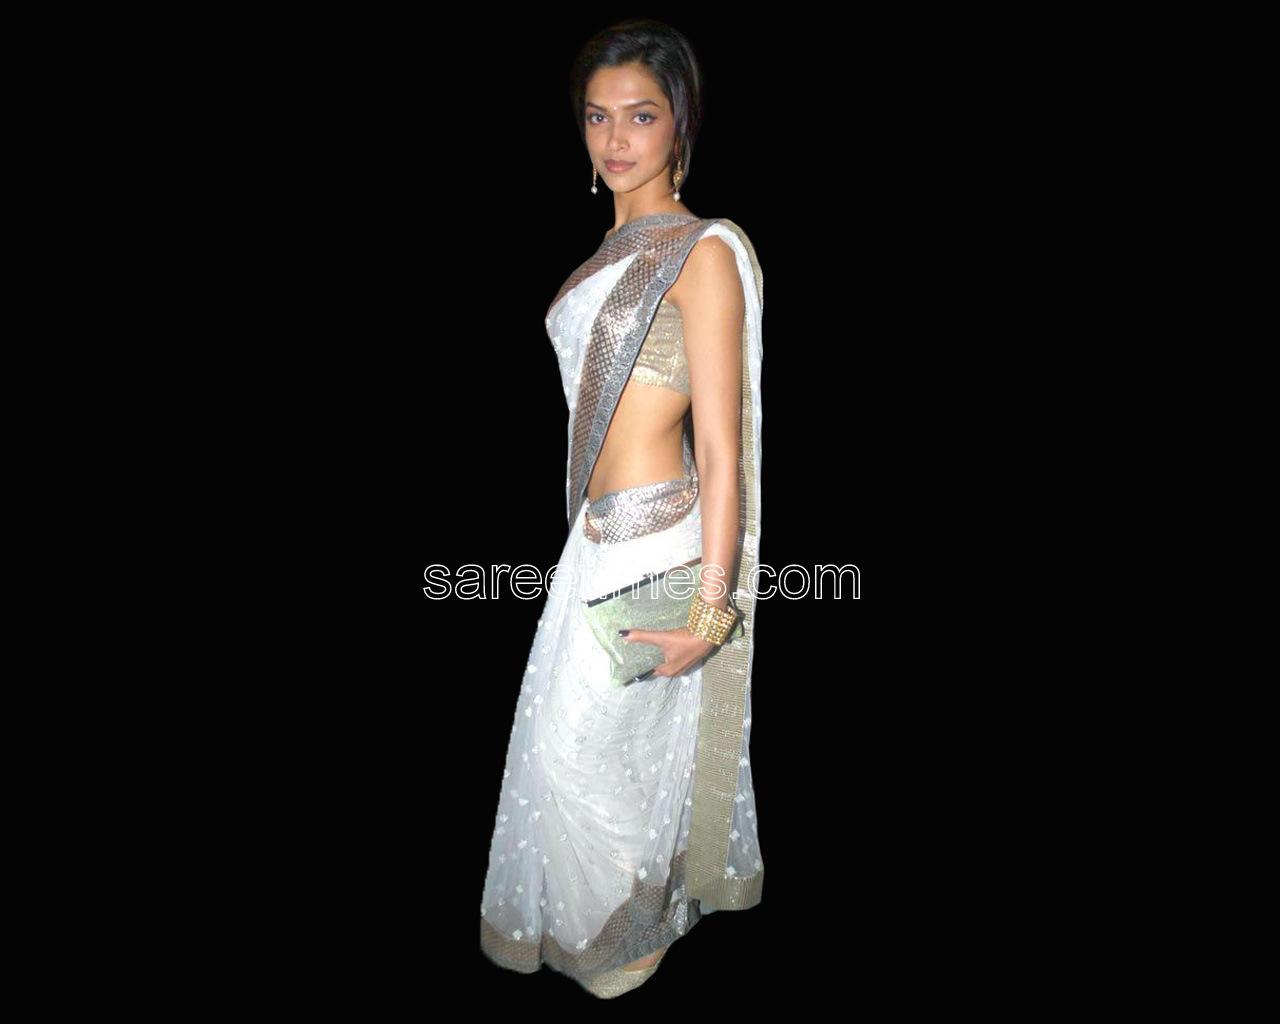 http://2.bp.blogspot.com/_58_qEOwiSDY/TDPYPlH6_JI/AAAAAAAADO8/mz_wPMI9vbE/s1600/Deepika-Padukone-White-Embroidery-Sari.jpg